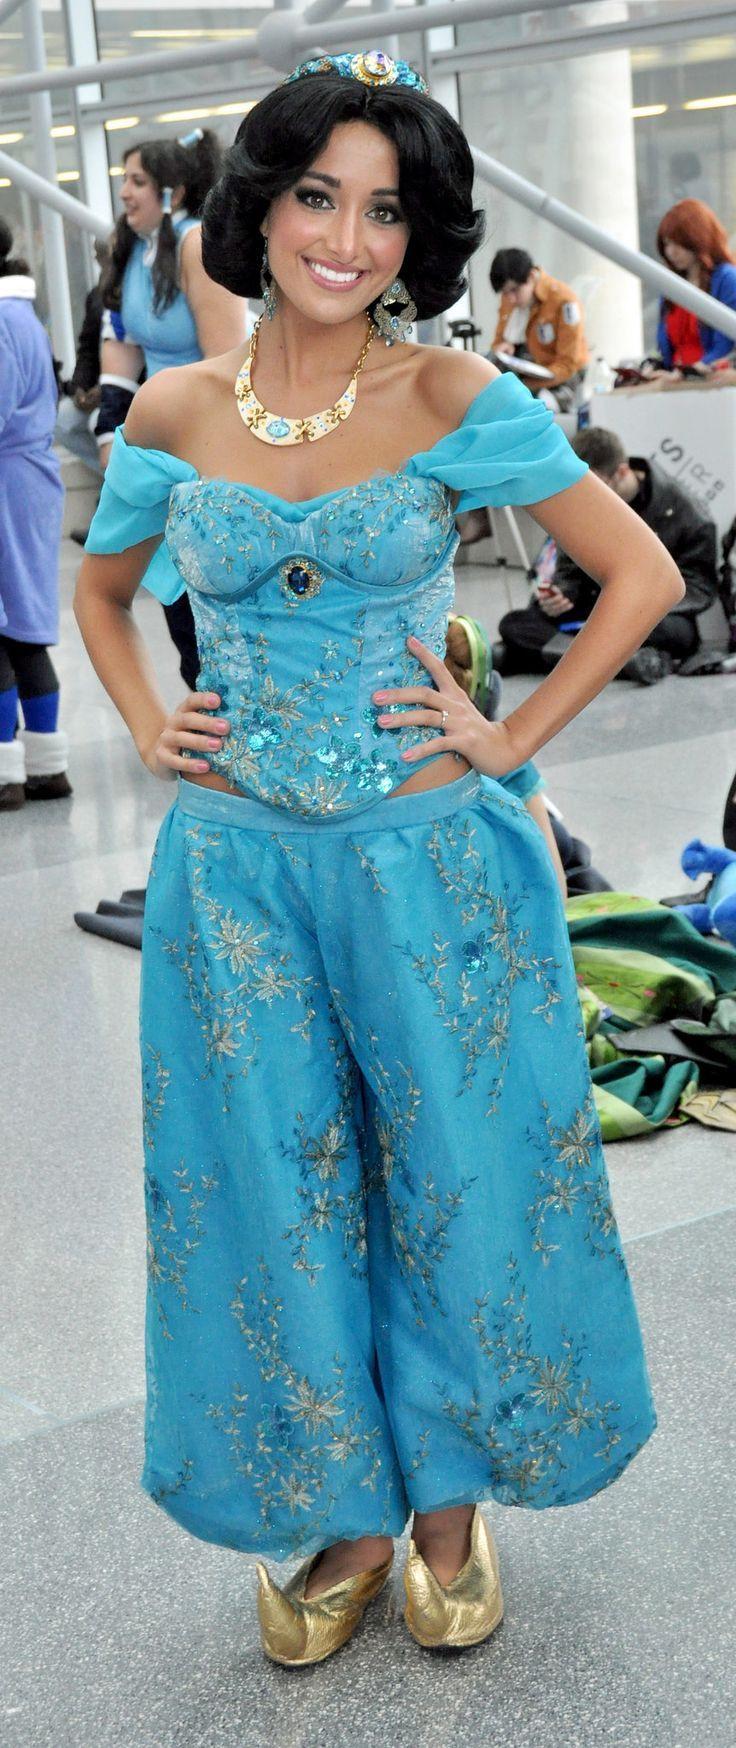 Best ideas about Jasmine DIY Costume . Save or Pin Best 25 Princess jasmine cosplay ideas on Pinterest Now.